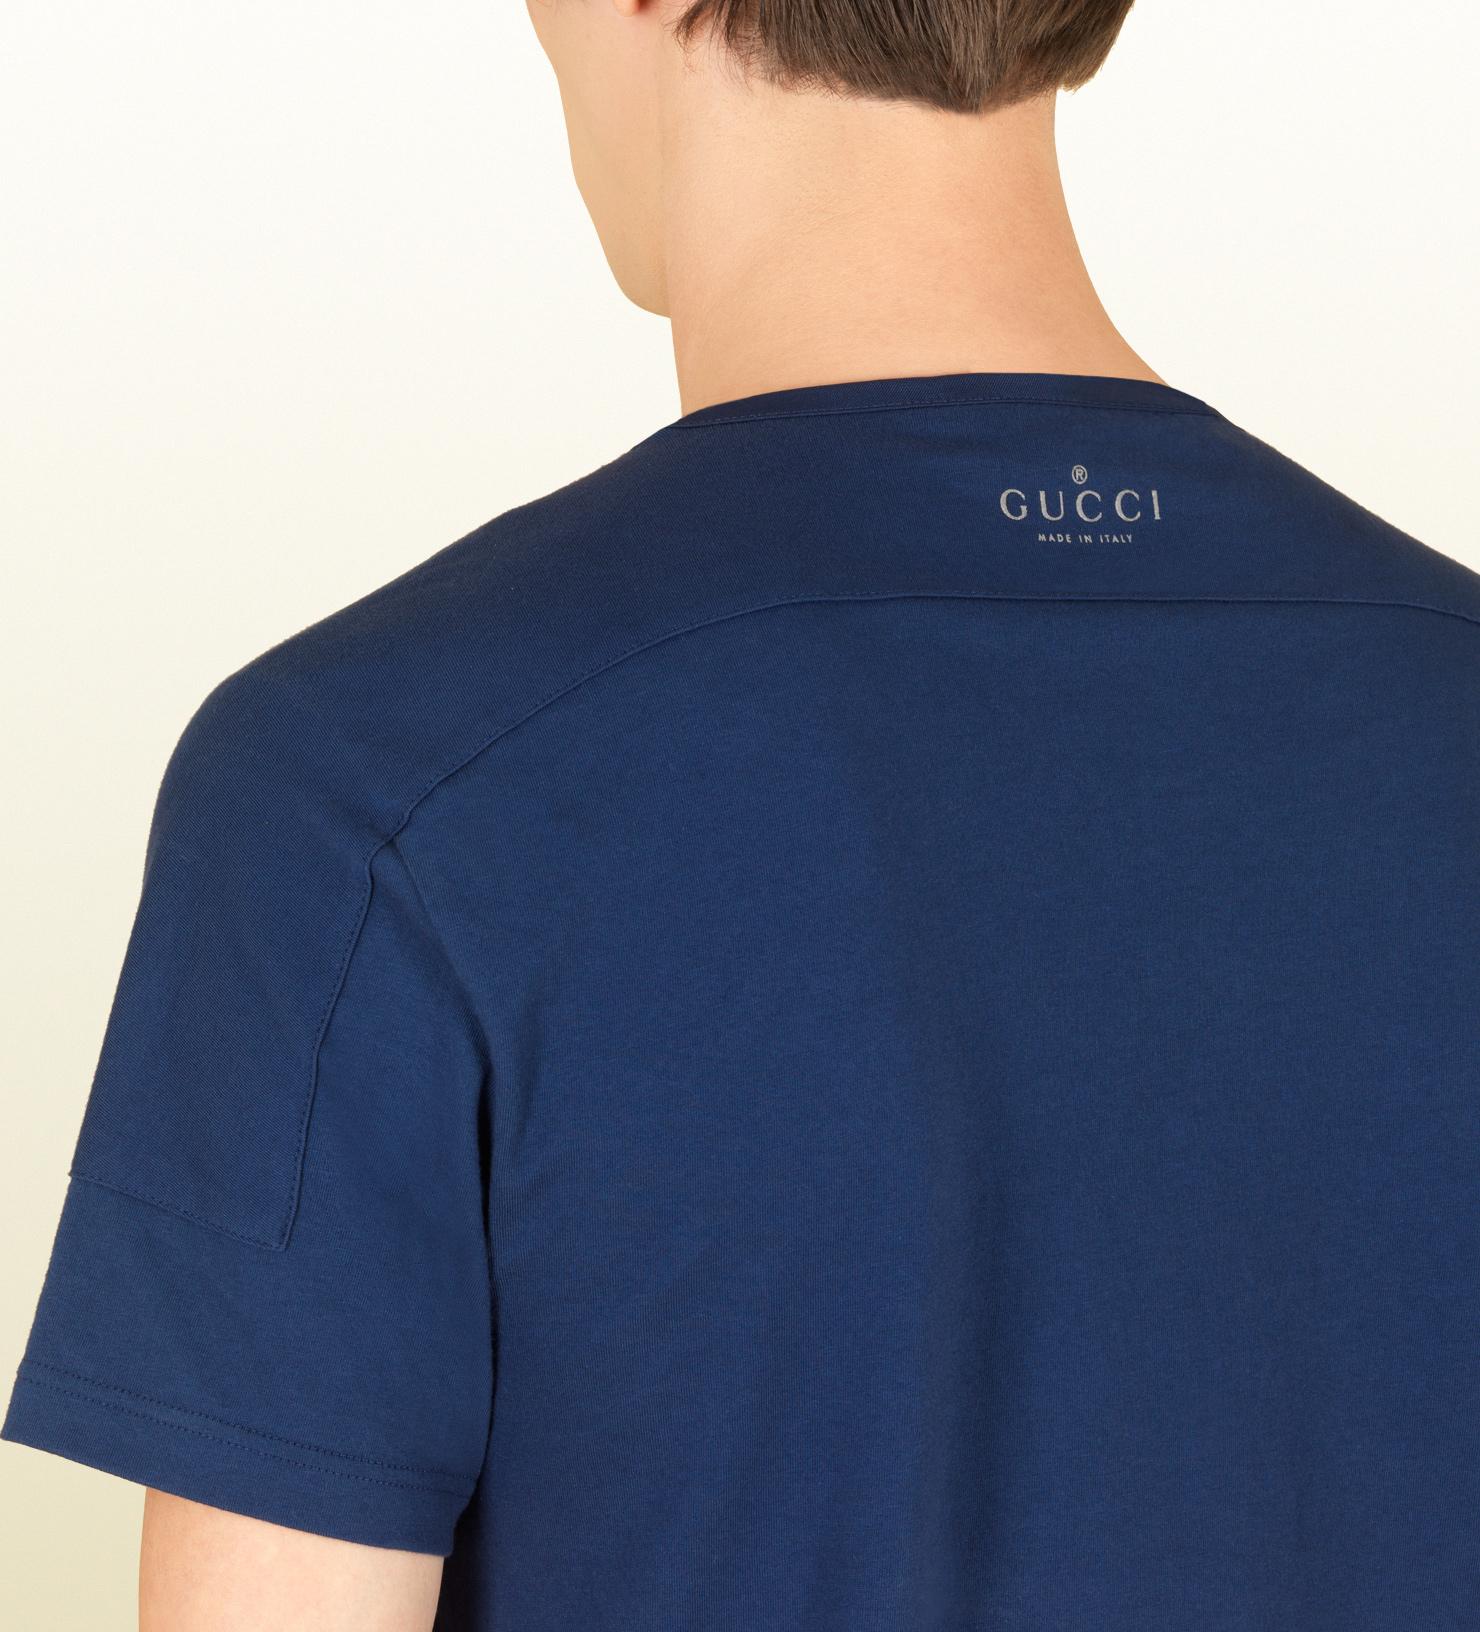 4a31c41b4b3b Gucci Dark Blue Silk and Cotton Jersey Tshirt in Blue for Men - Lyst